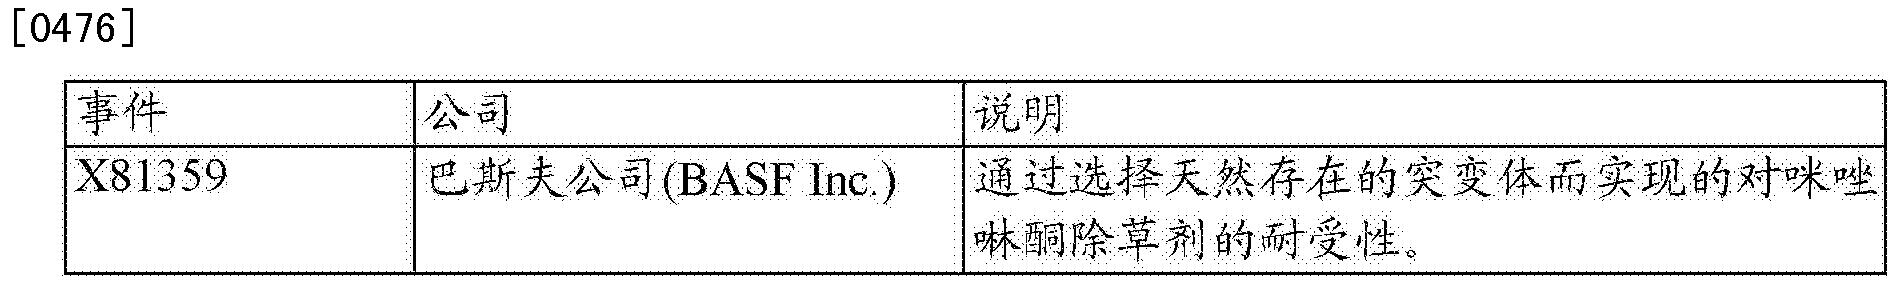 Figure CN105473605AD01221